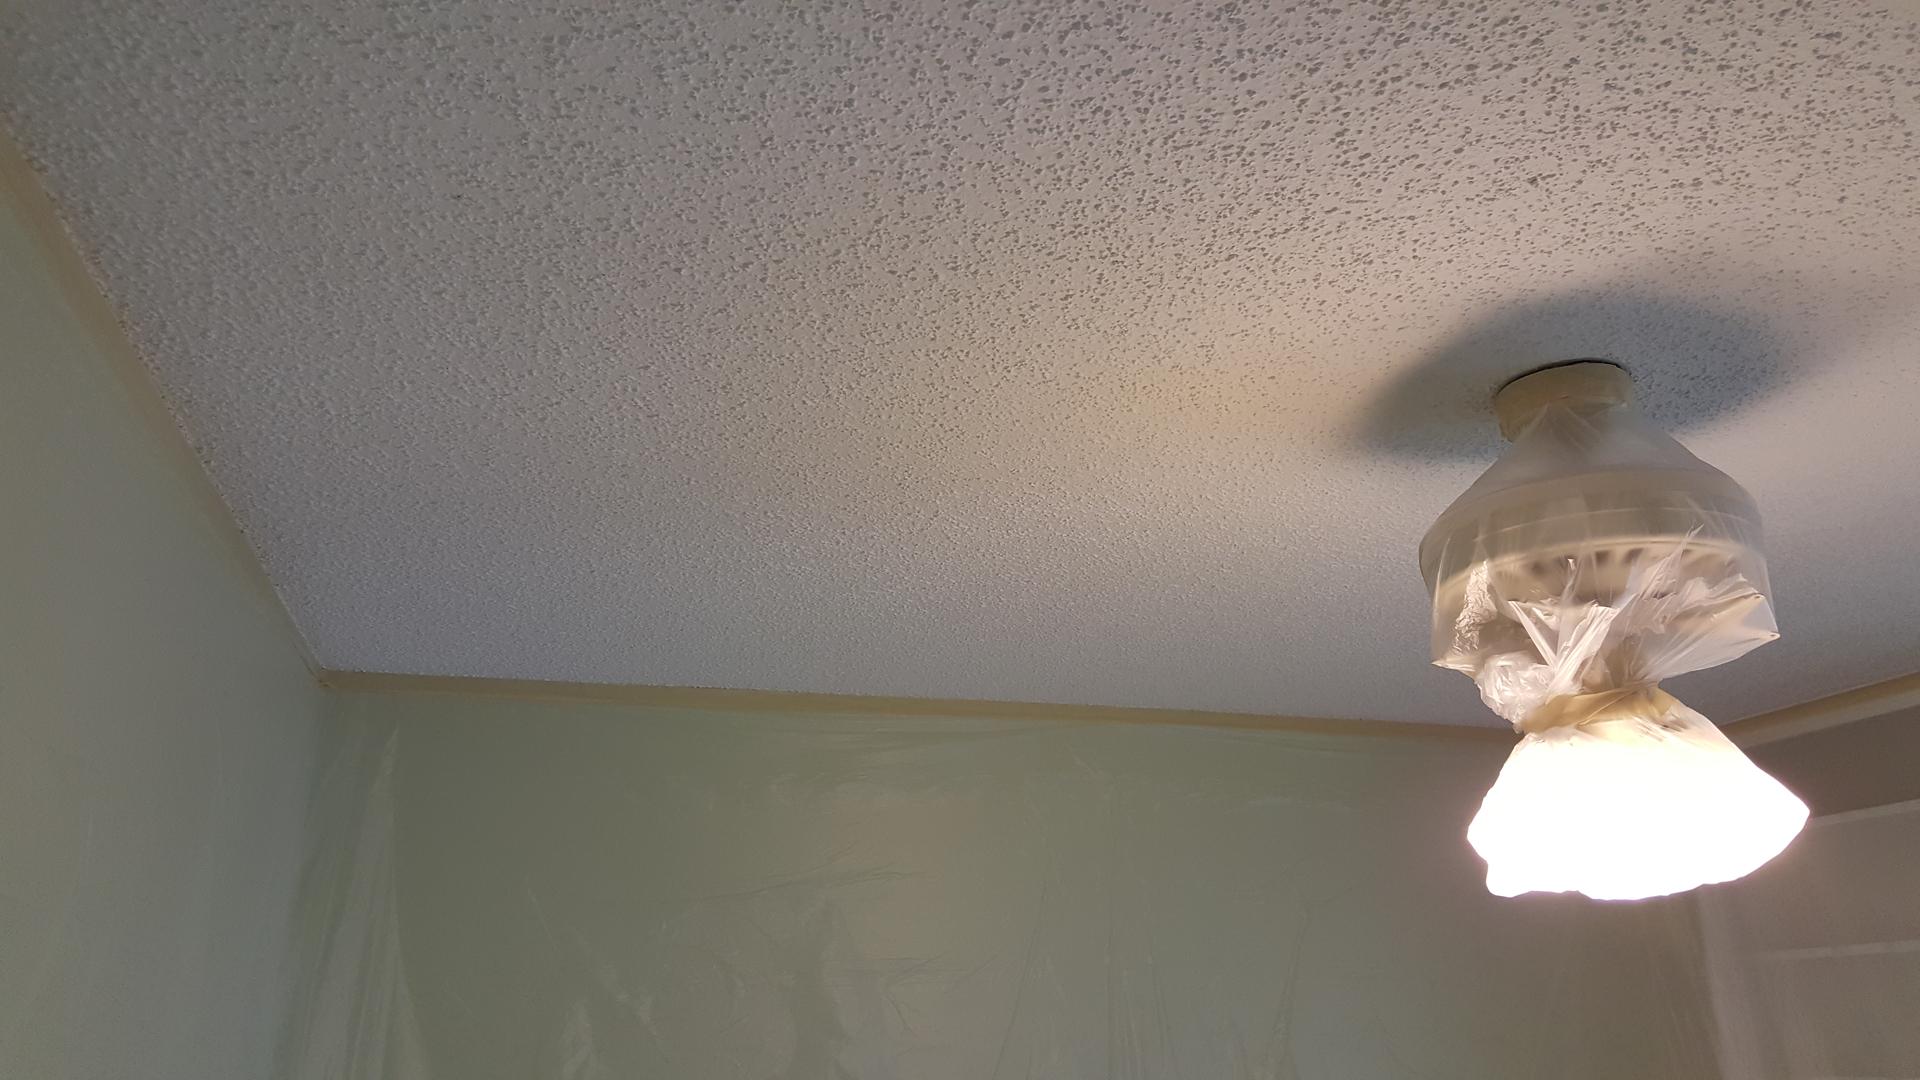 Drywall renovation popcorn removal texture paint wallpaper